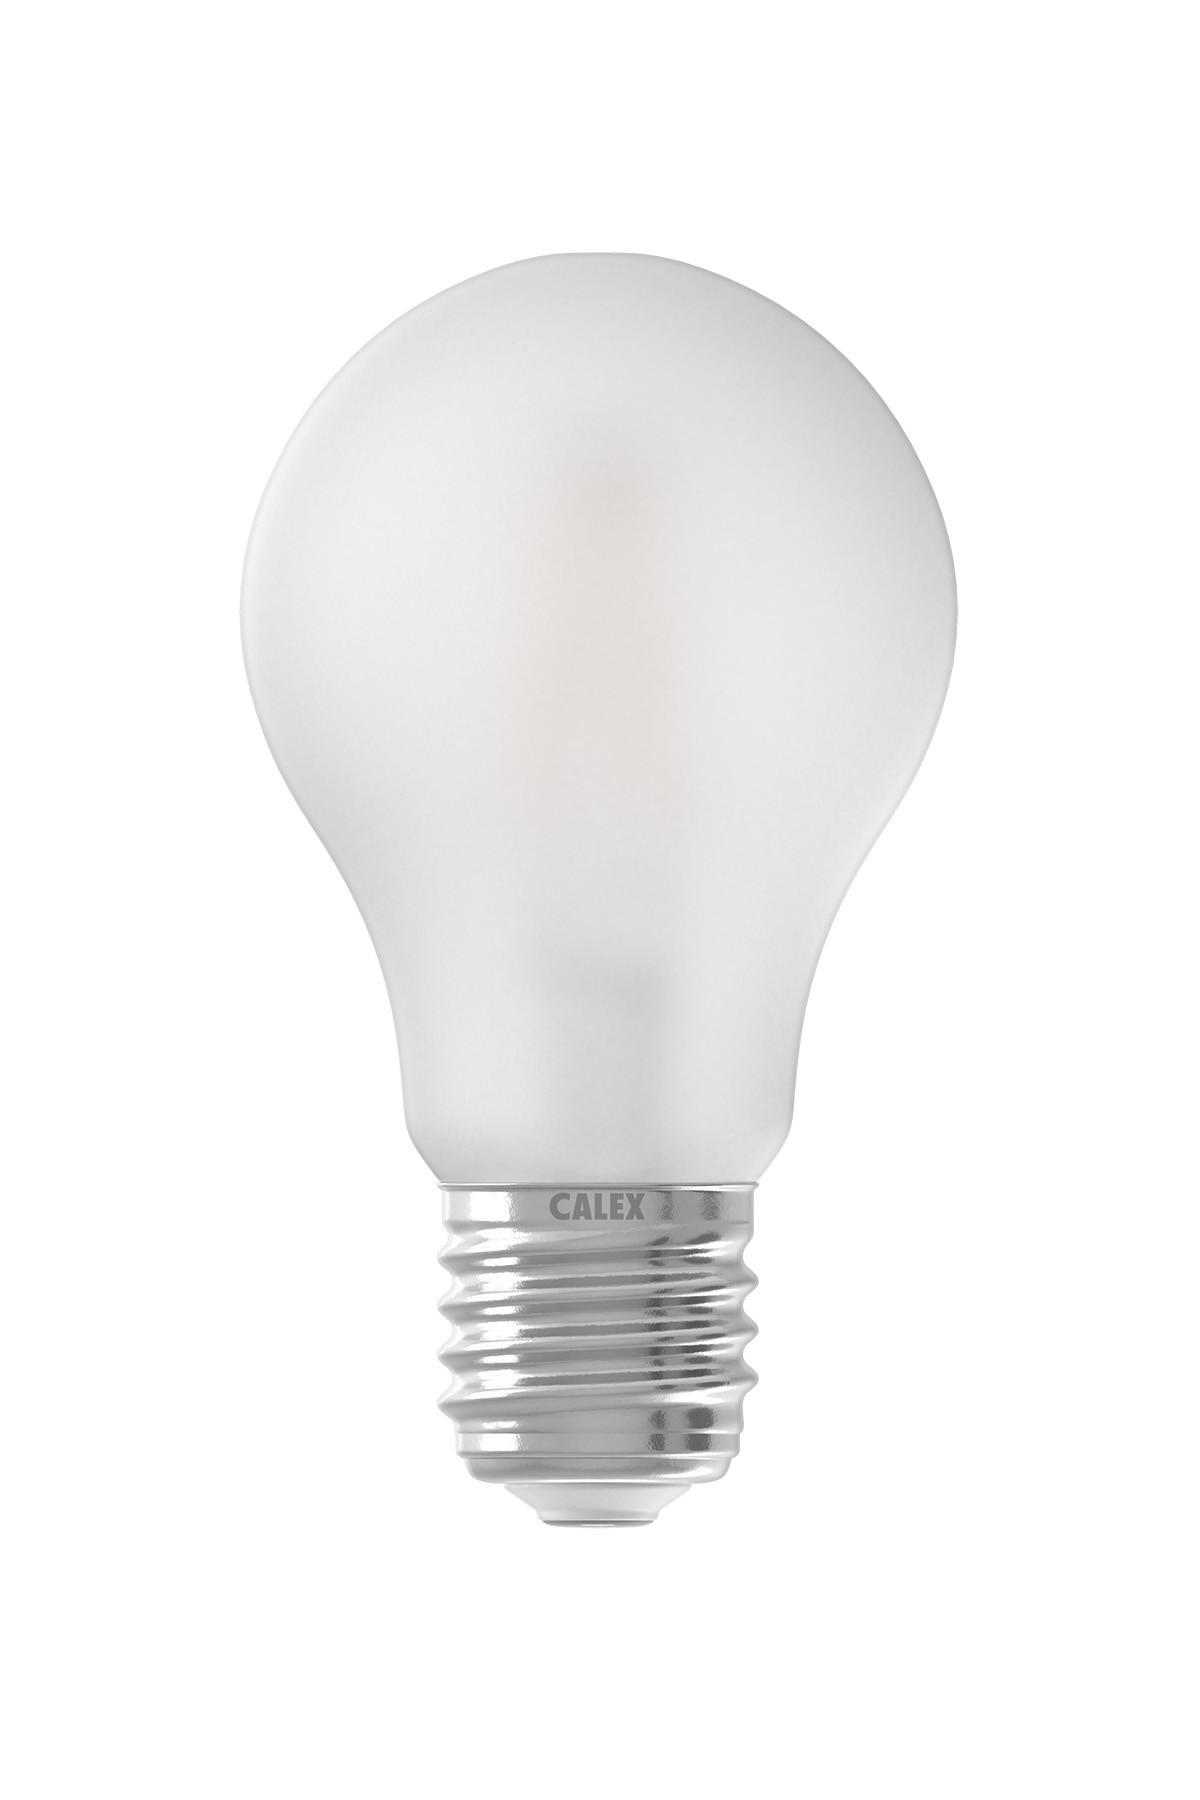 Calex Satin Mat LED A60 Standaardlamp 220-240V 1,3-2,8-5,5W 150-350-600lm E27, 2700K 3 staps